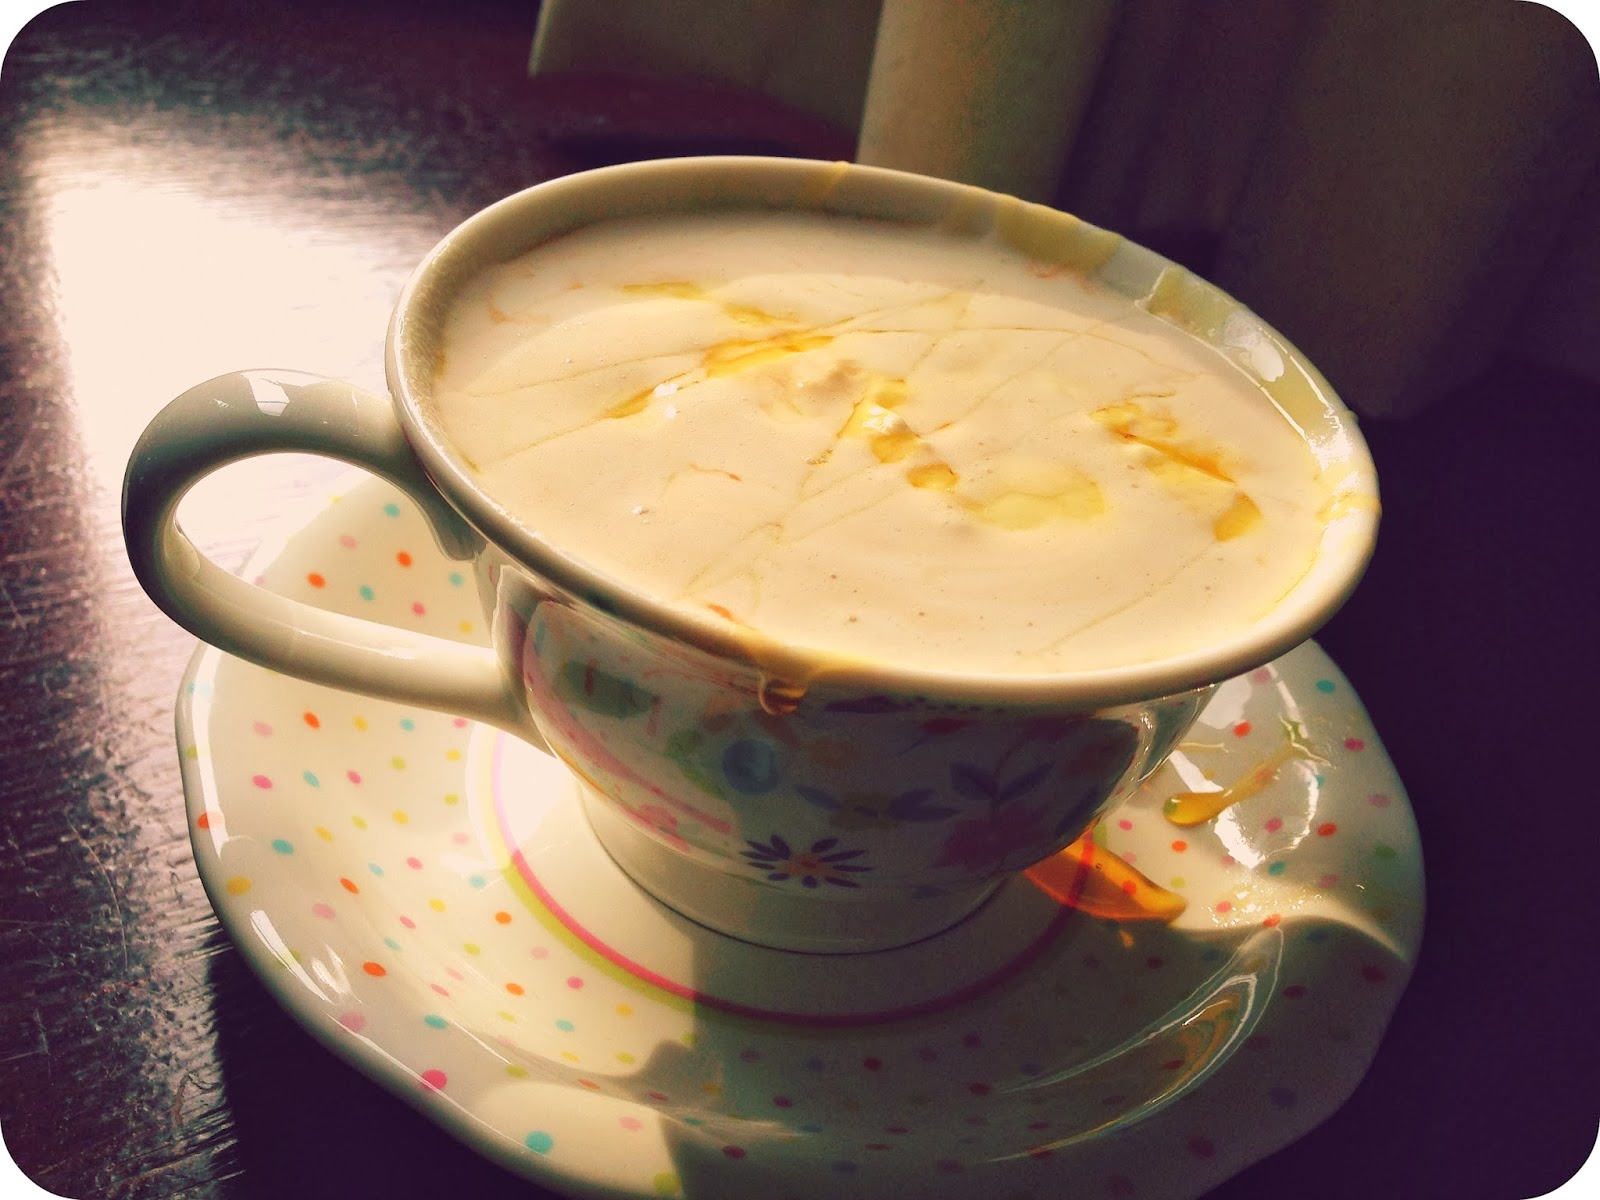 Winter Warmers: Easy Boozy Salted Caramel Hot Chocolate | Vinspire